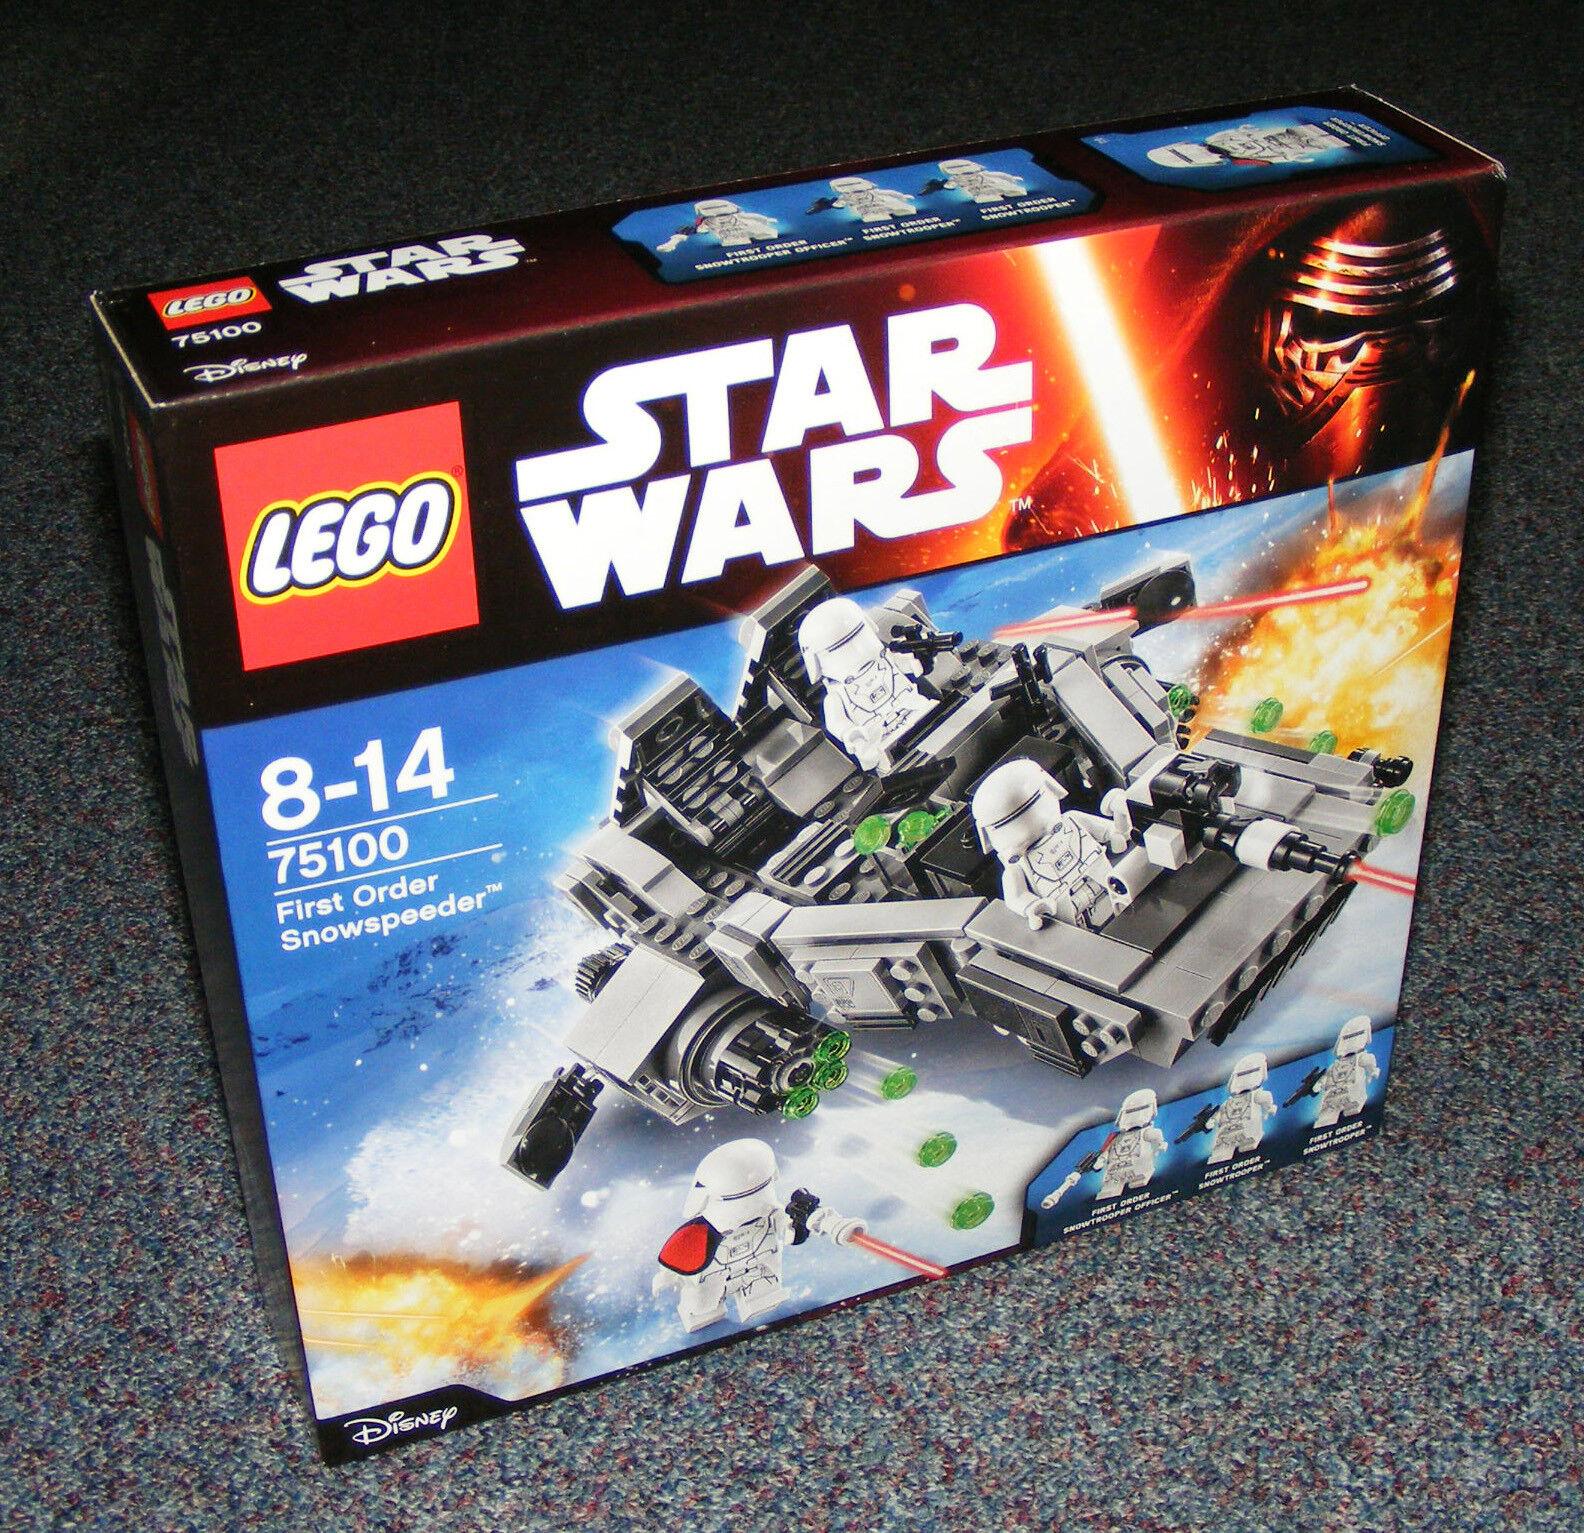 STAR WARS LEGO 75100 FIRST ORDER SNOWSPEEDER BRAND NEW SEALED SEALED SEALED 86bb92